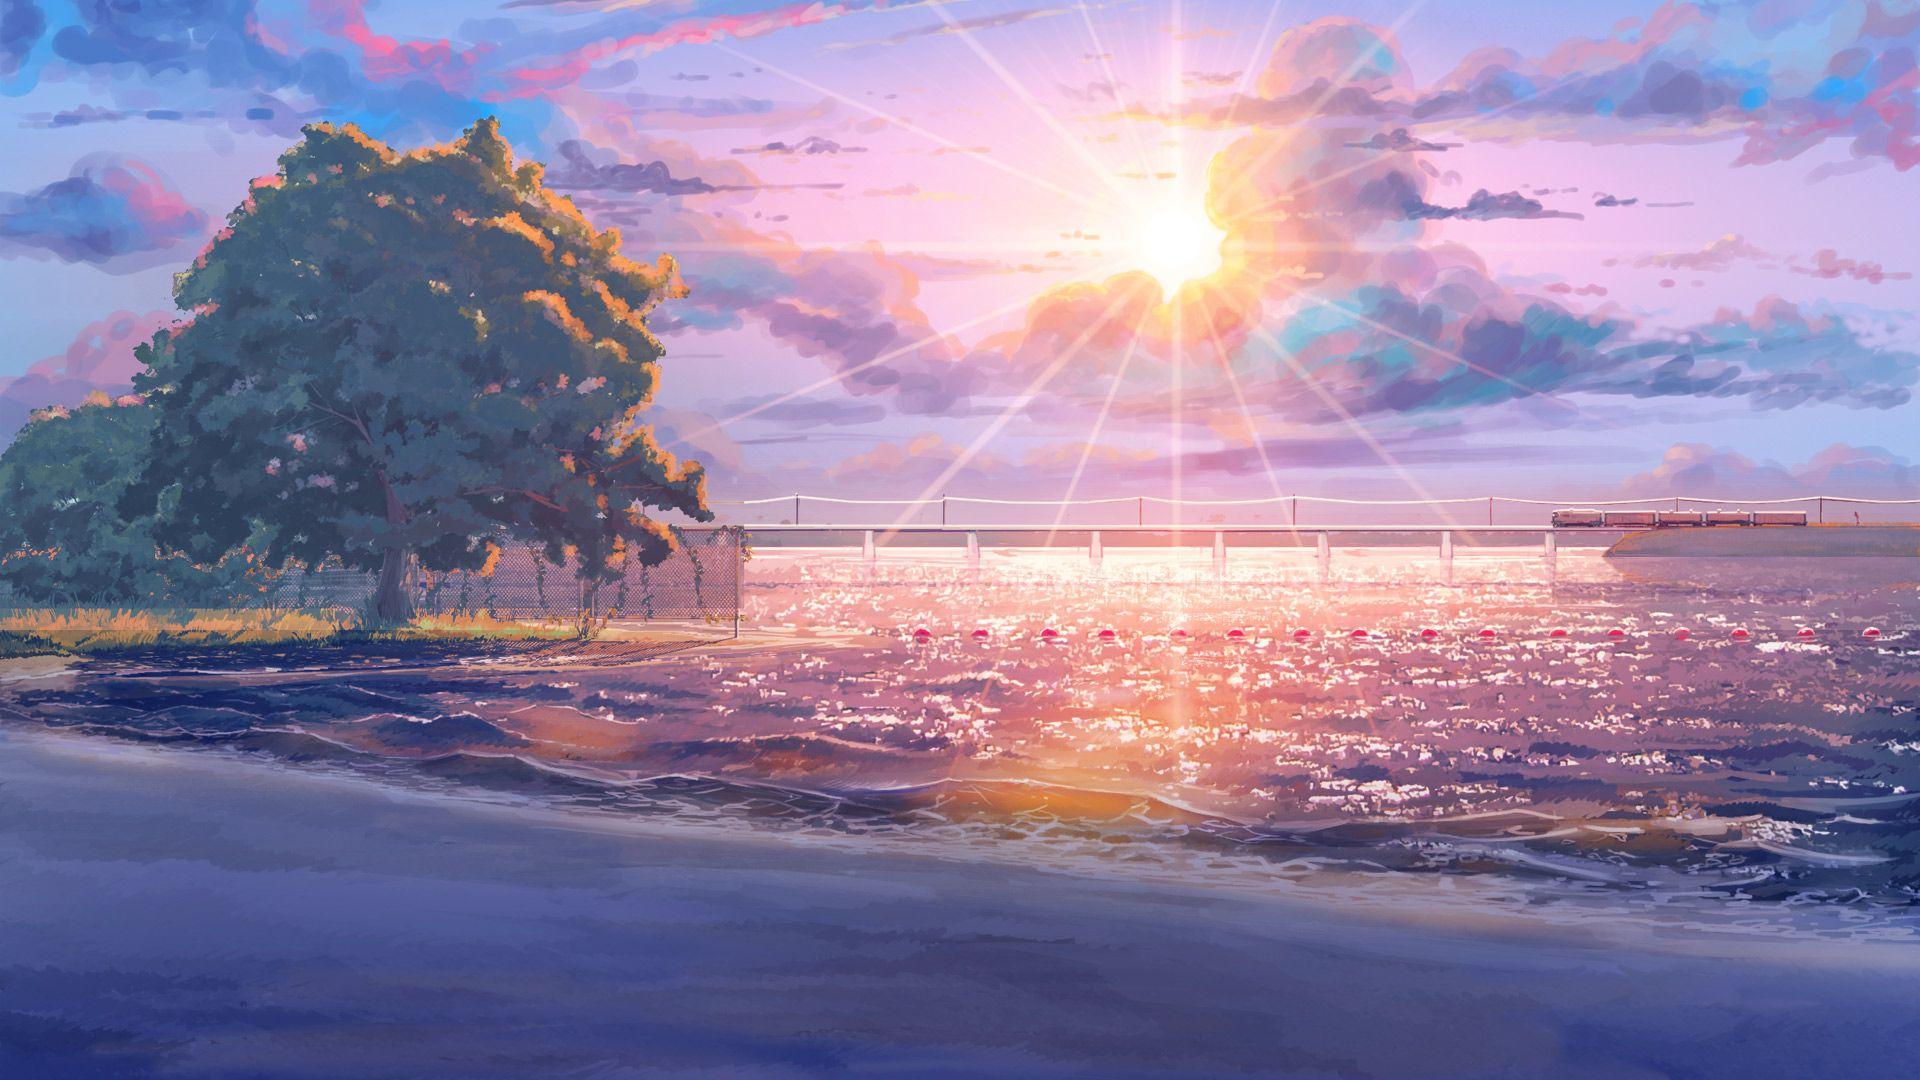 311440 1920x1080 Iichan Eroge Arsenixc Vvcephei Wide Image Highres Game Cg Jpg 1920 1080 Scenery Wallpaper Landscape Wallpaper Anime Scenery